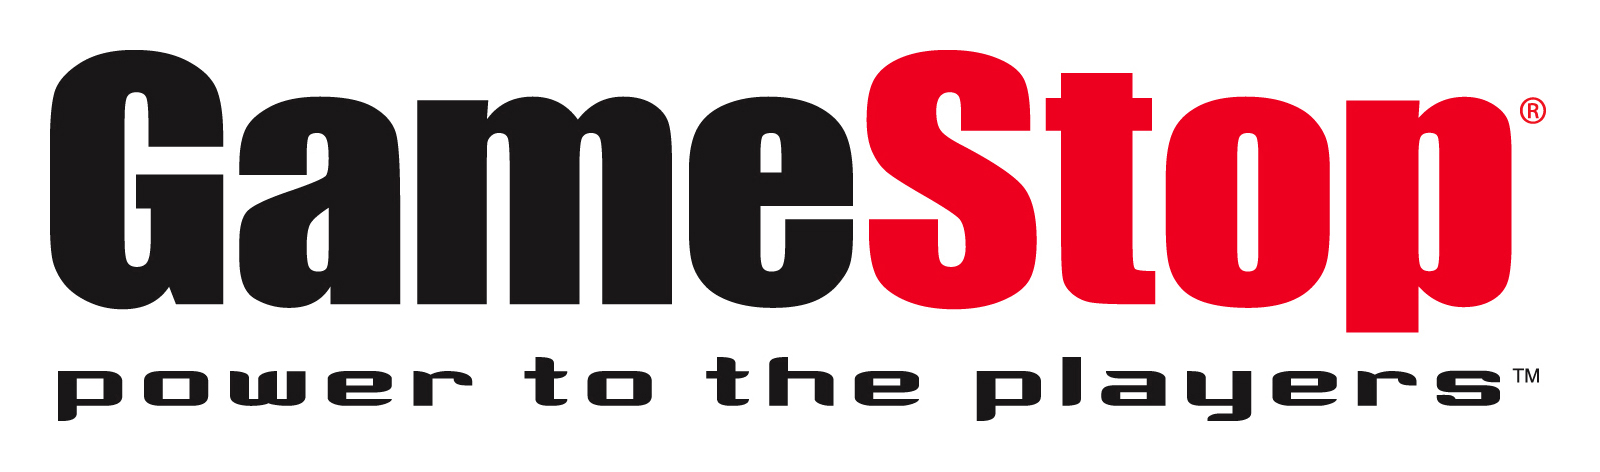 Gamestop Corporation logo